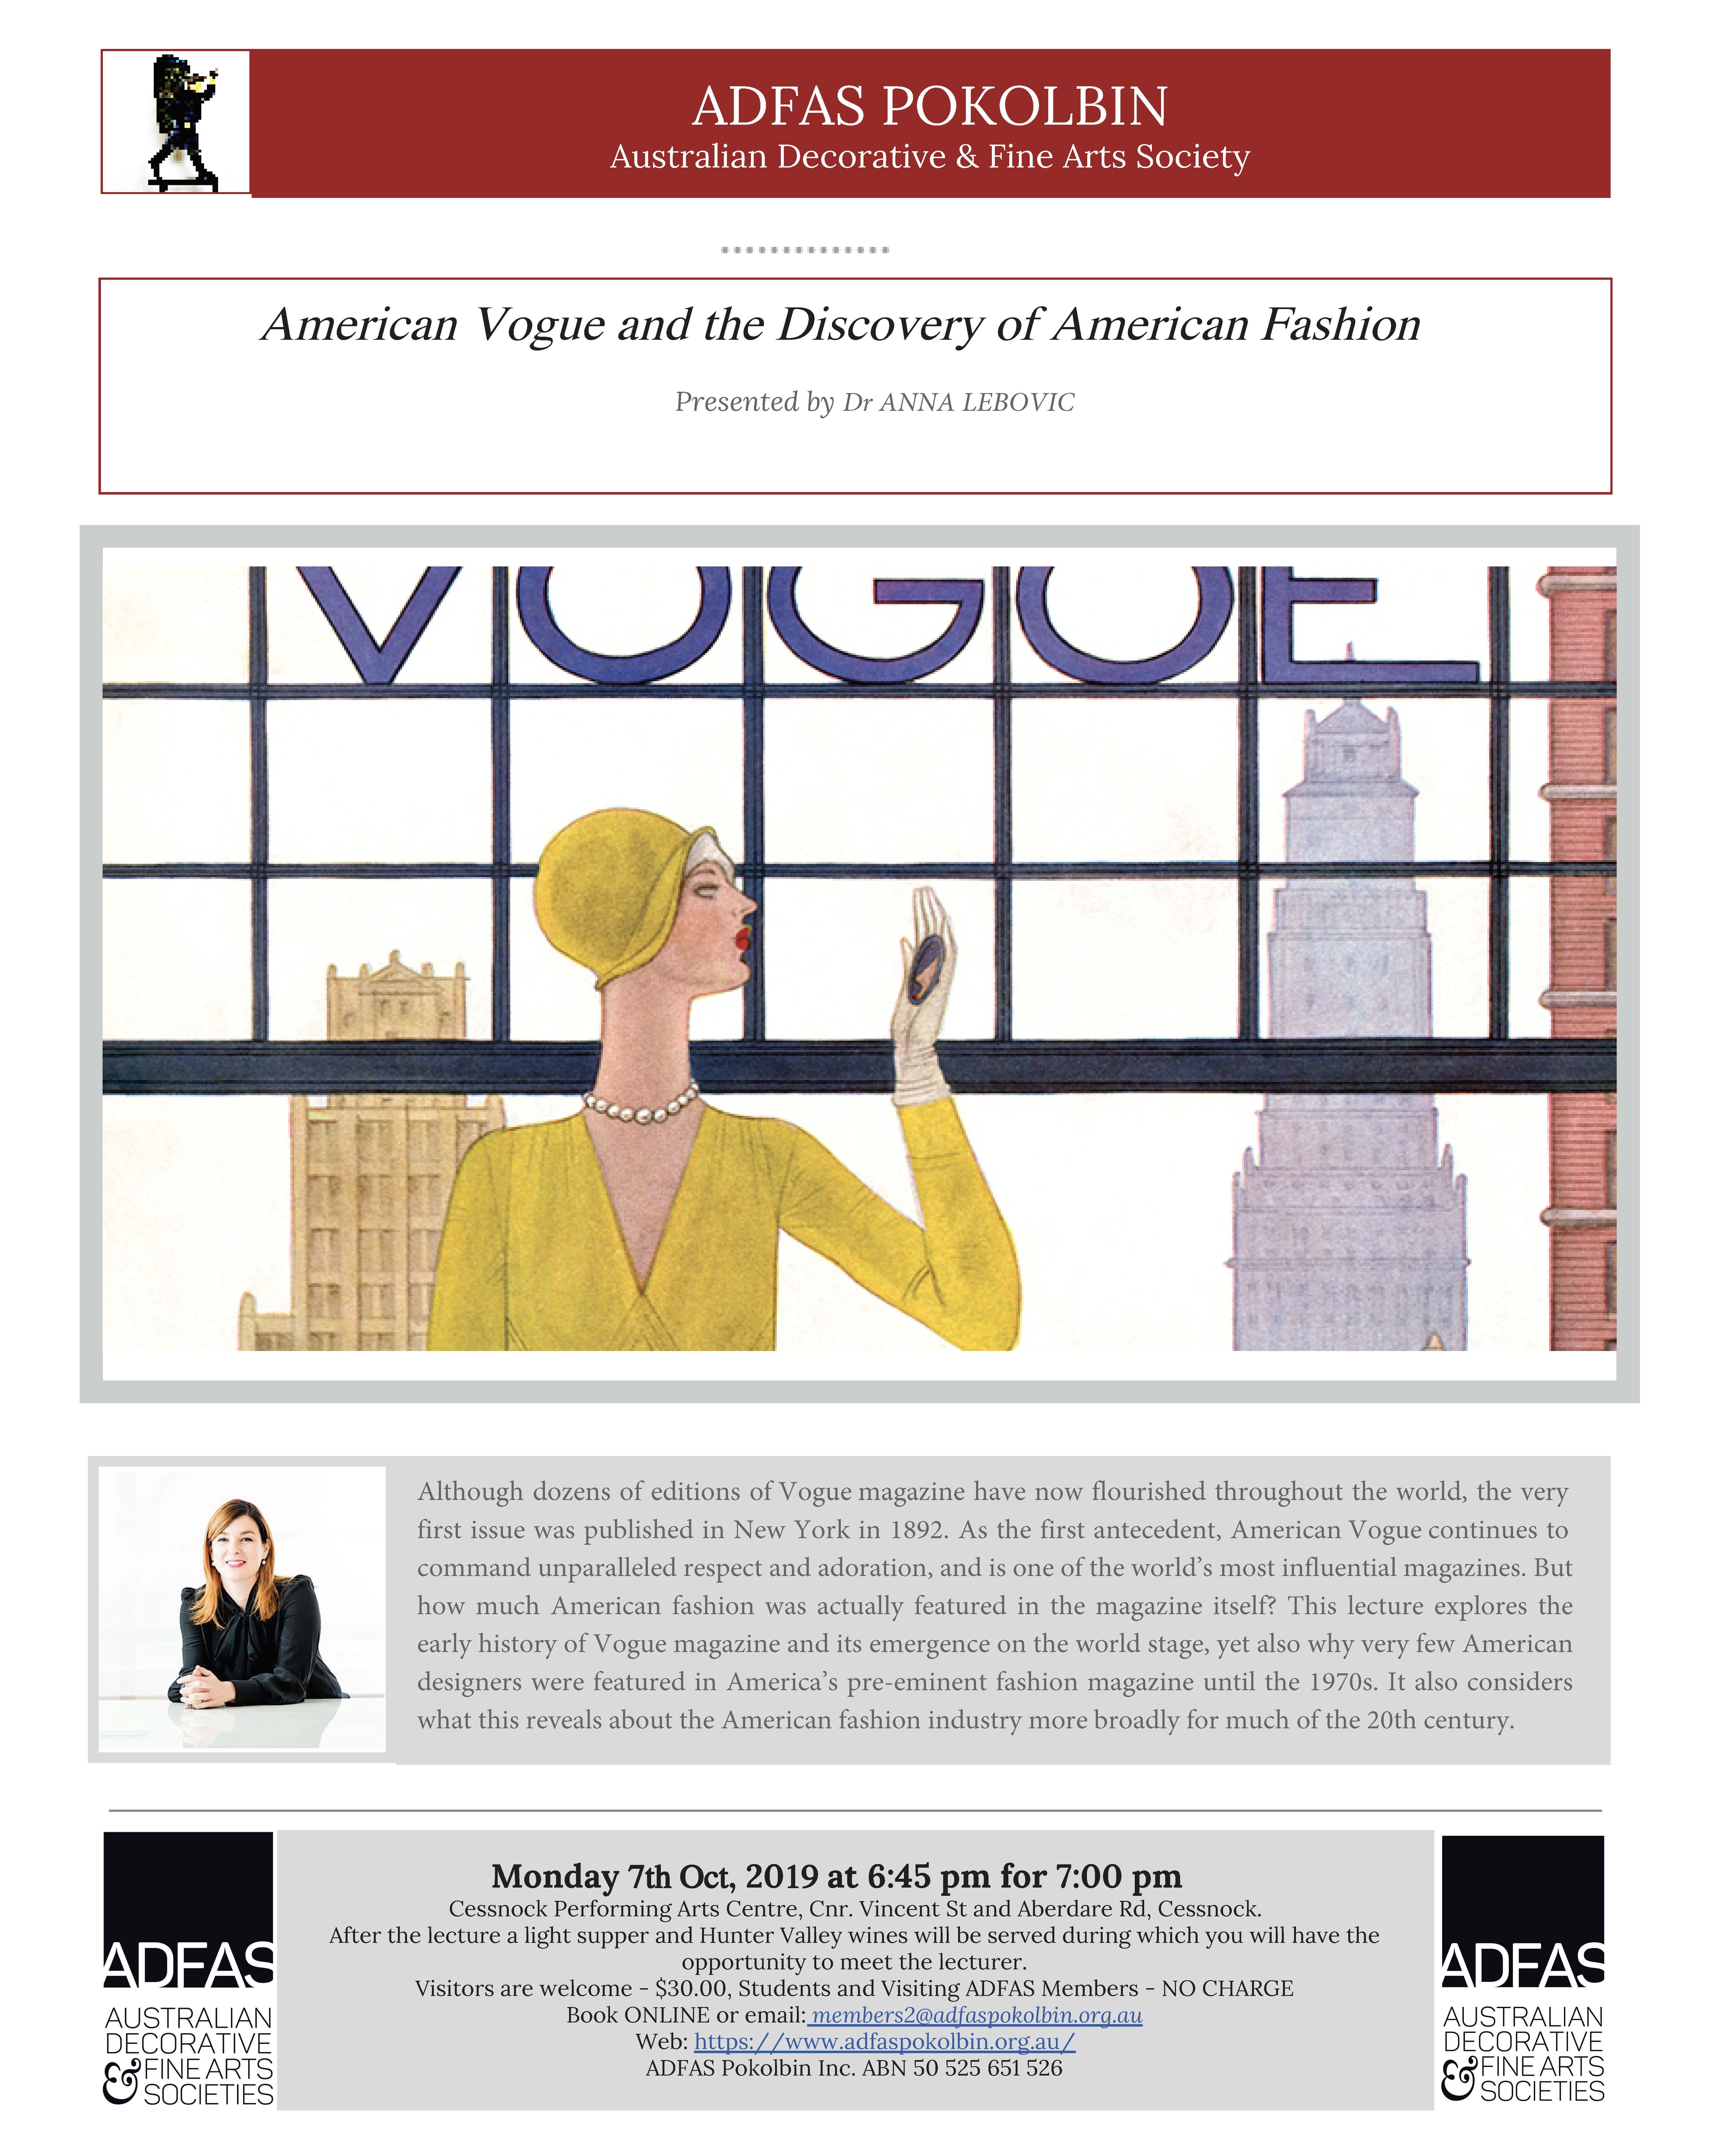 American Vogue